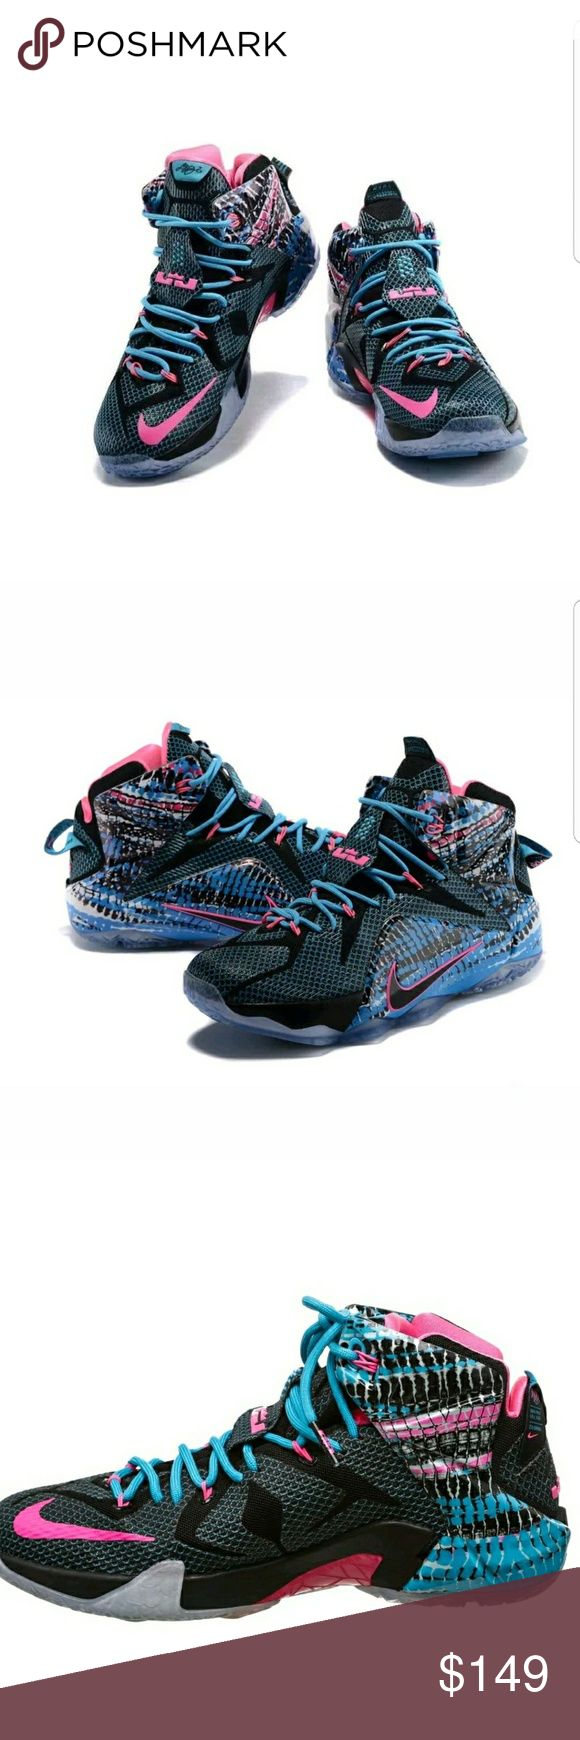 Nike Men's Lebron XII